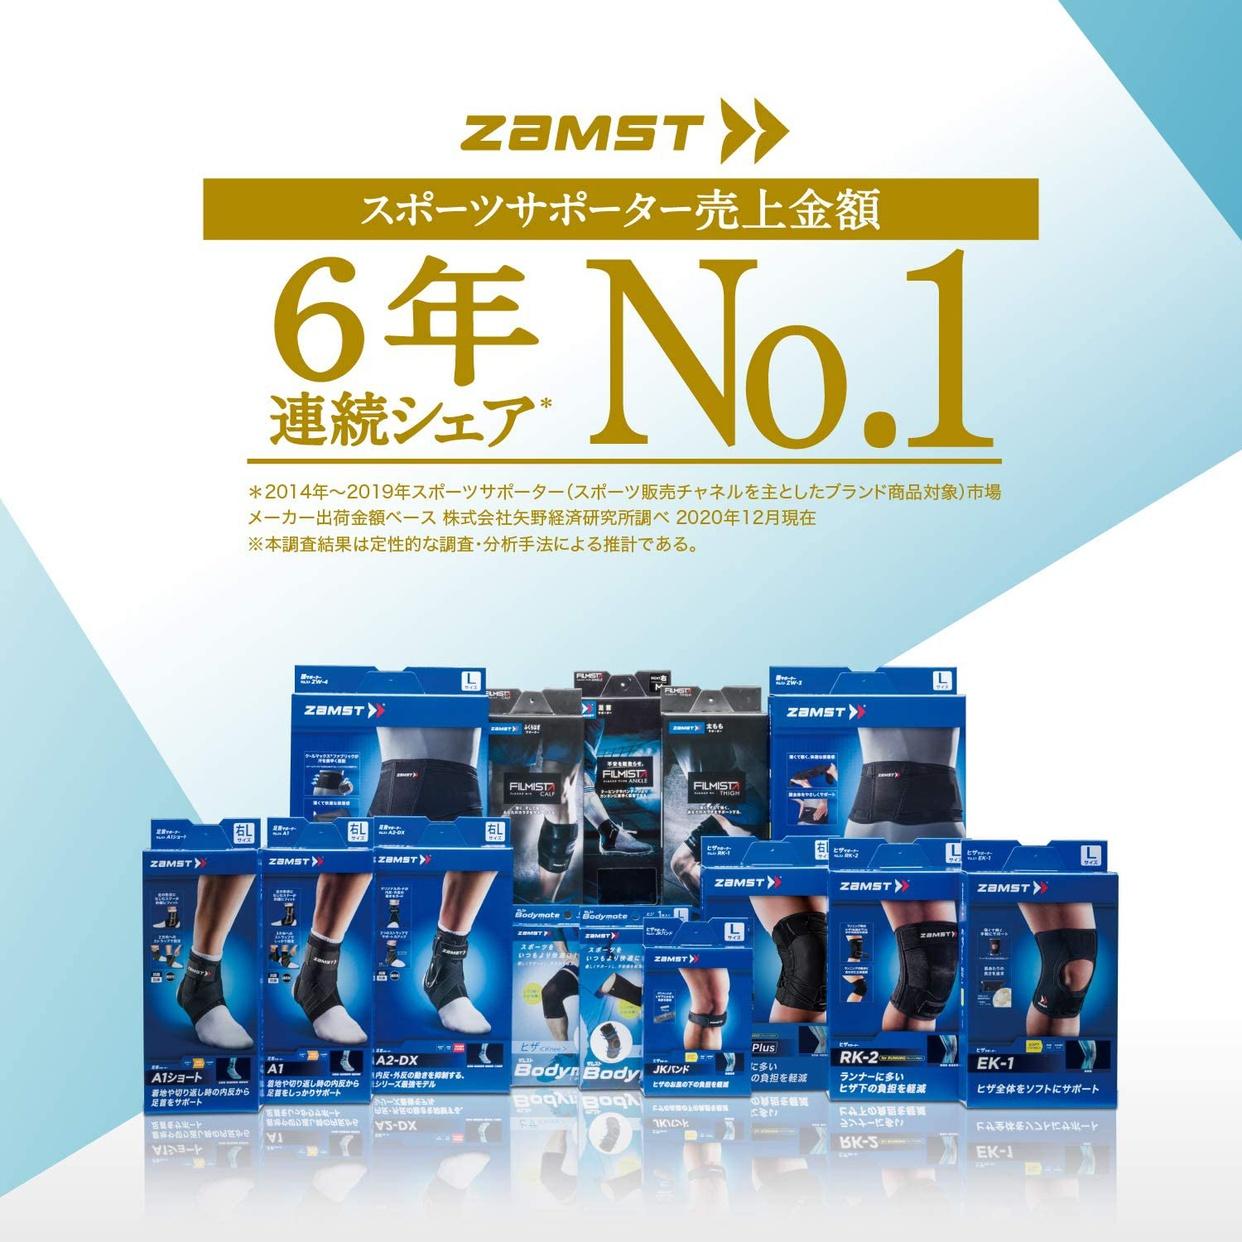 ZAMST(ザムスト) ヒザ用サポーター JK-1の商品画像2